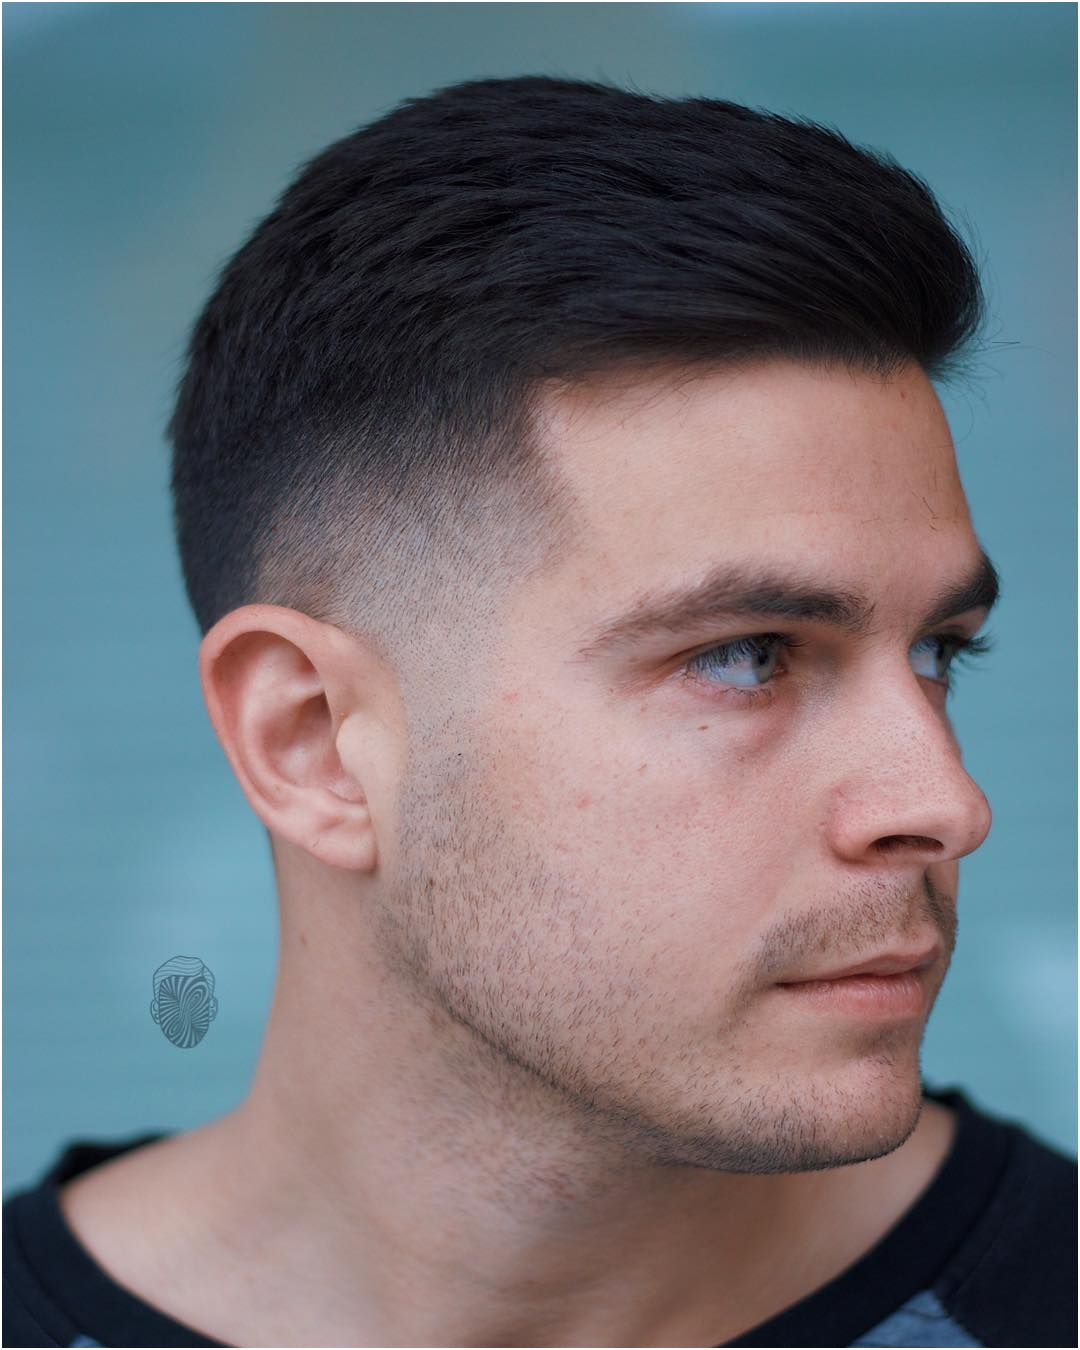 Top 25 Low Maintenance Haircuts For Men 2019 Guide ...